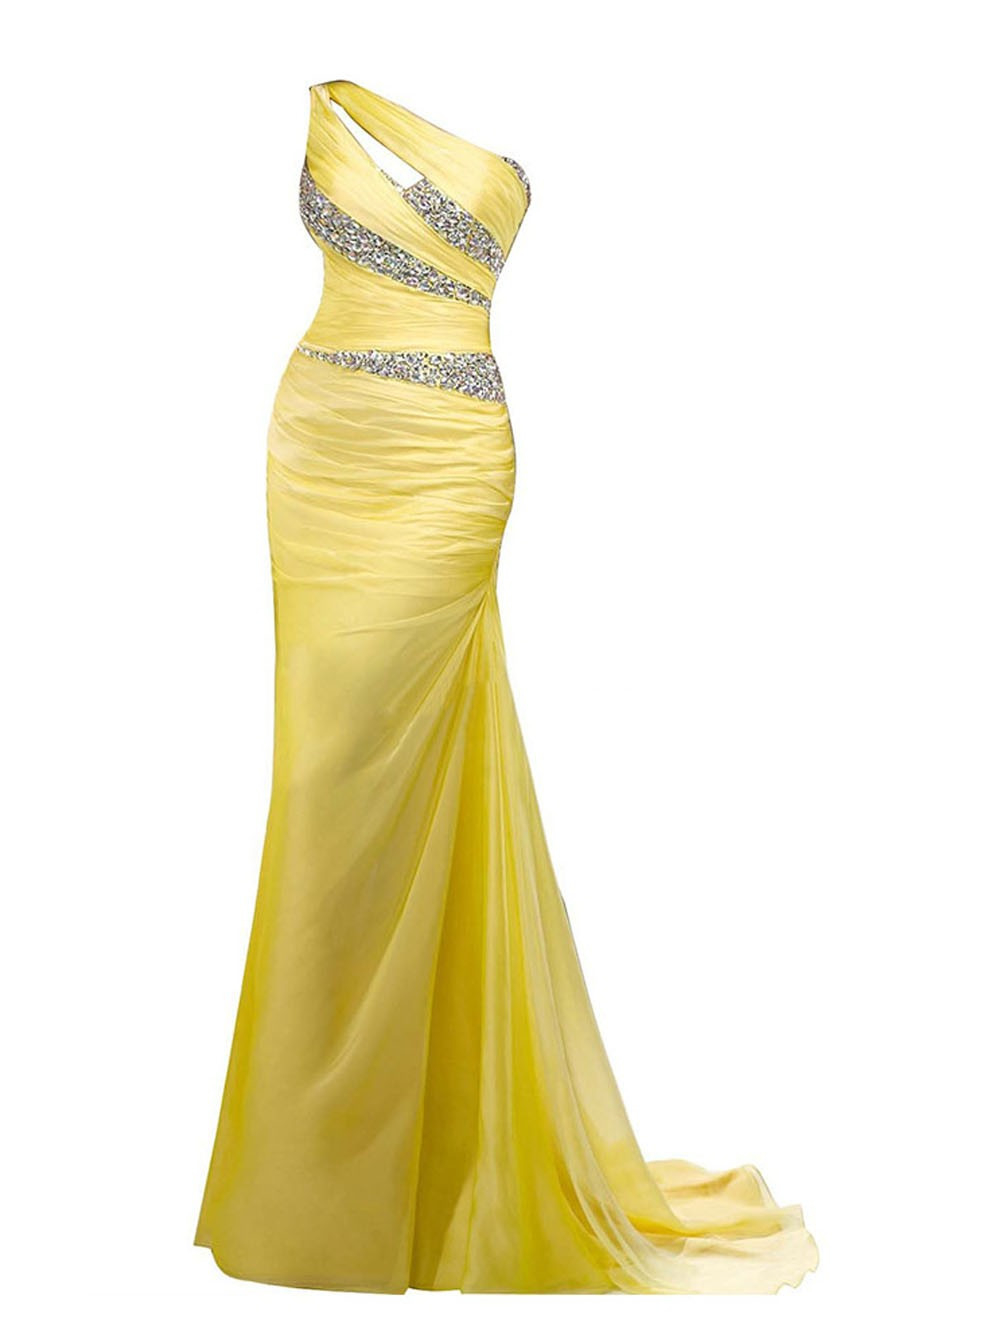 Perfekt Abendkleid In Gelb Bester Preis15 Spektakulär Abendkleid In Gelb Spezialgebiet